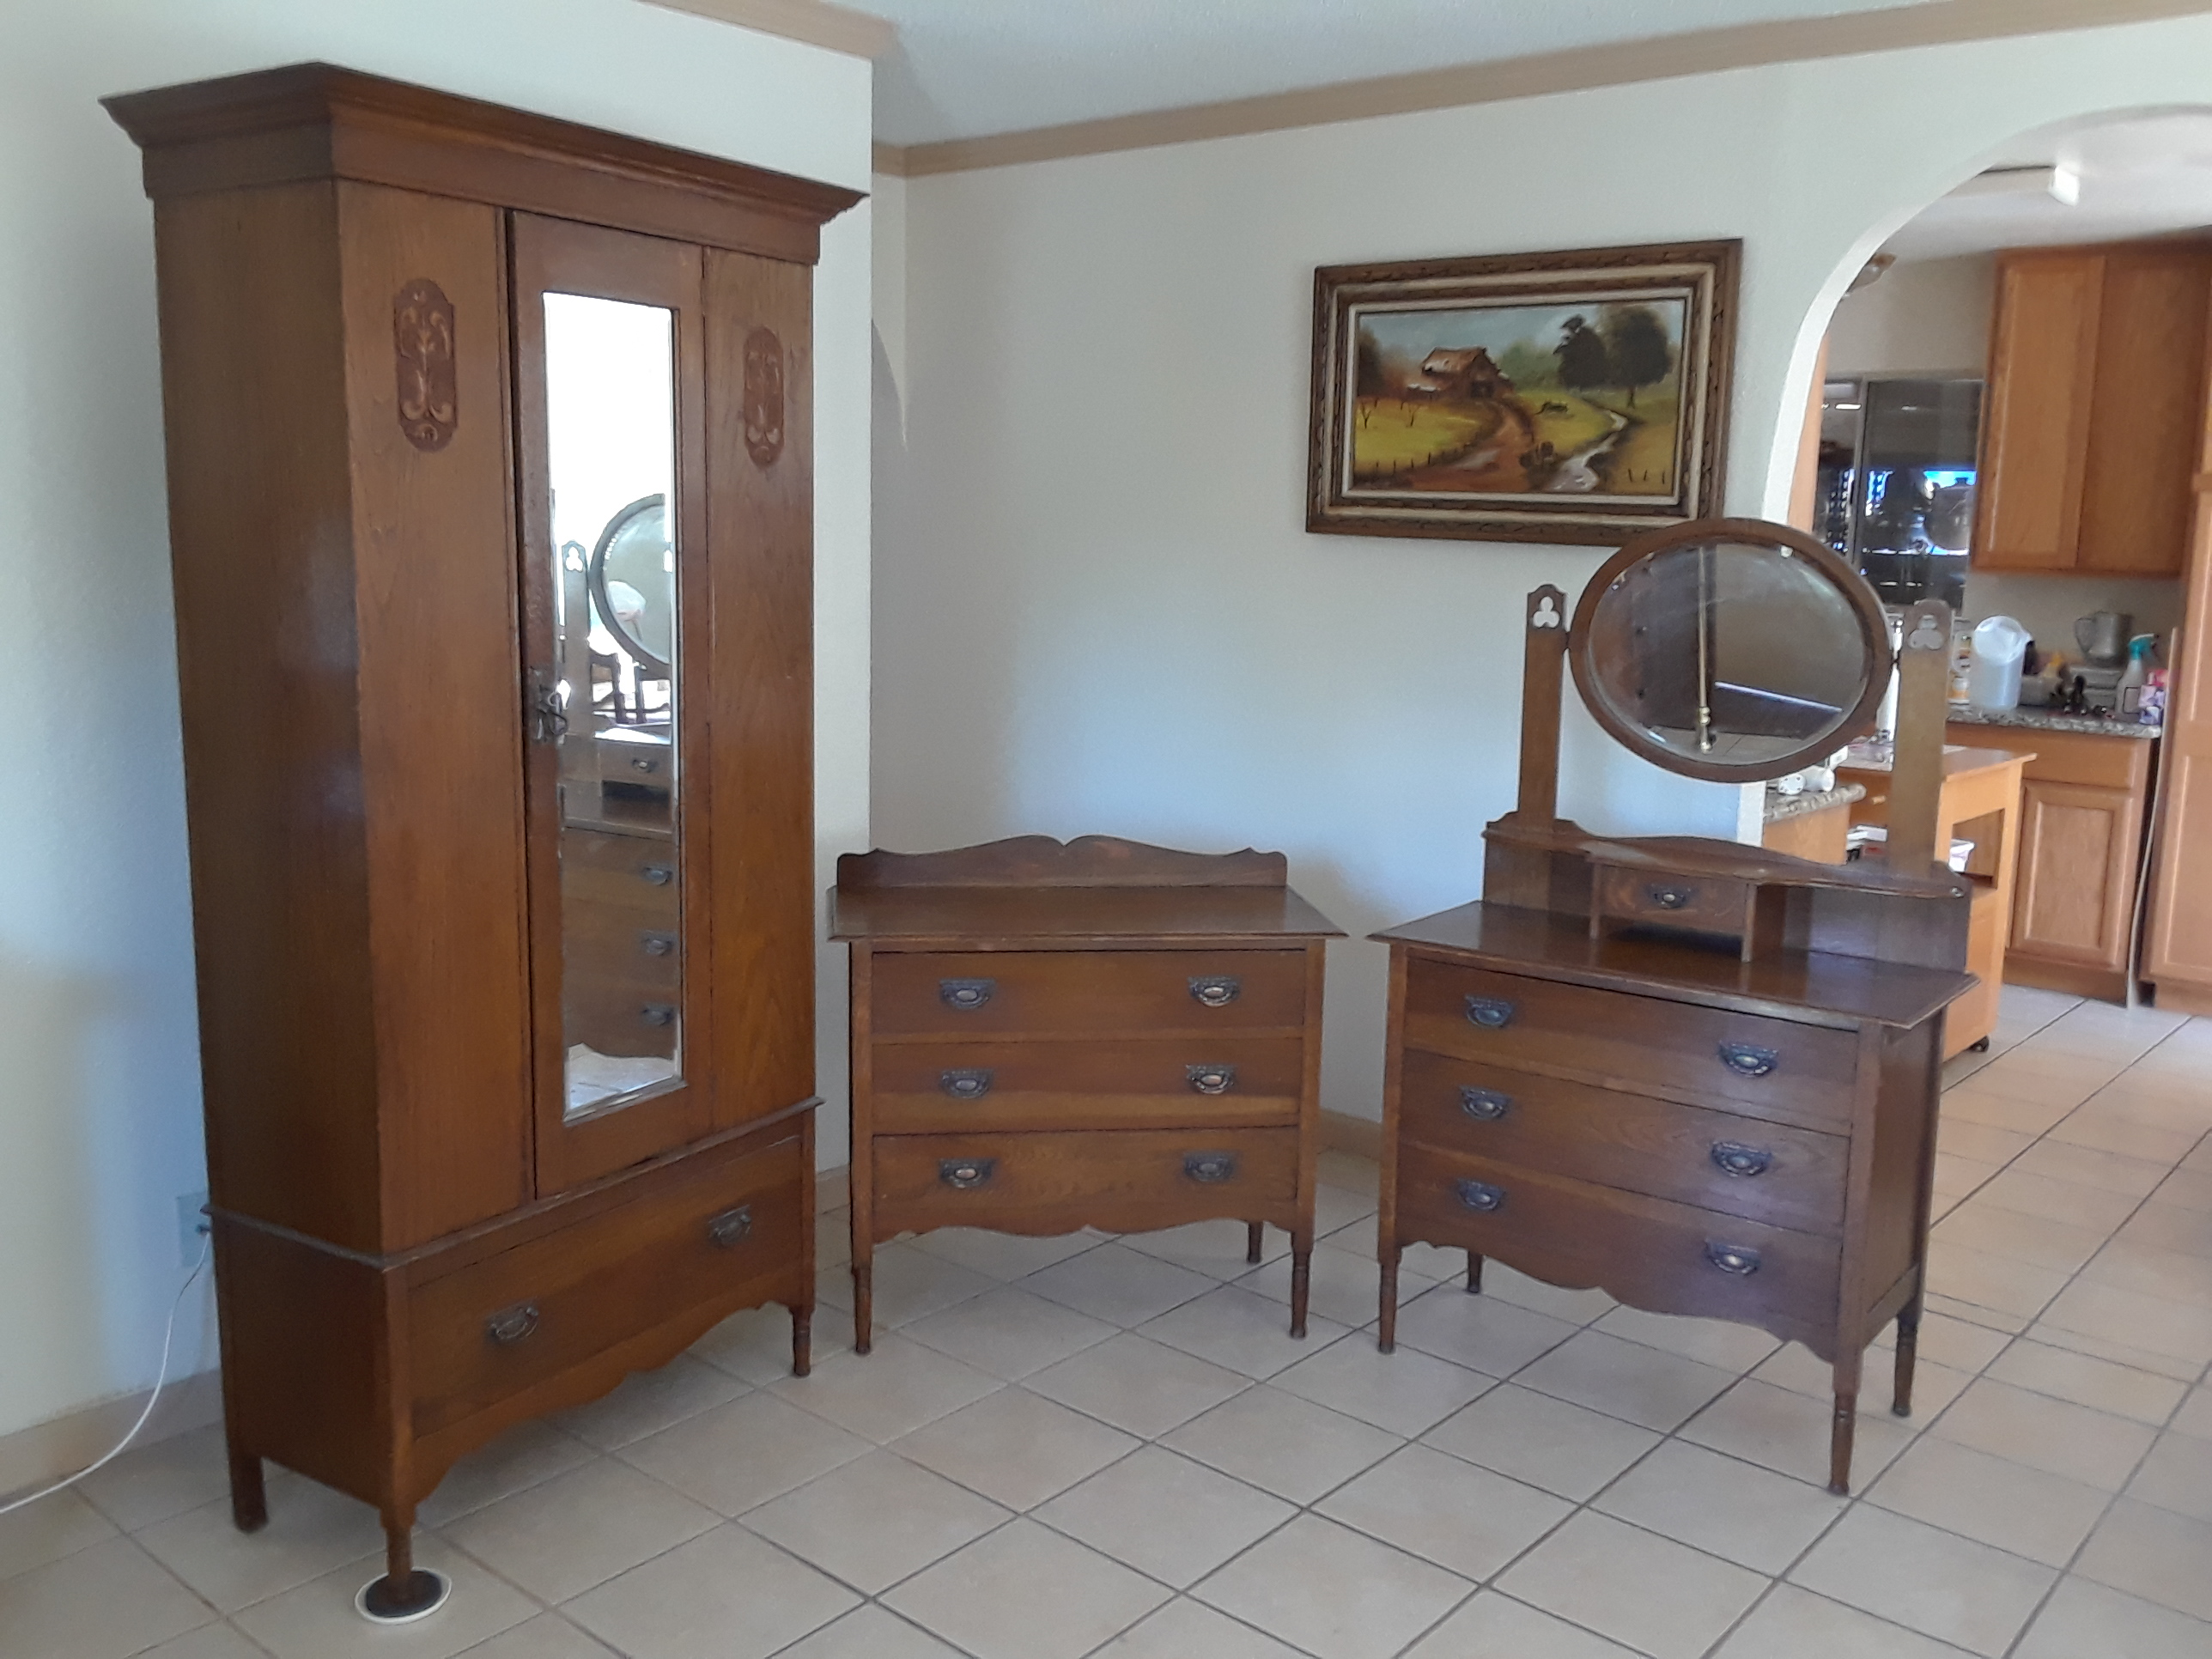 Antique bedroom furniture antique appraisal | InstAppraisal